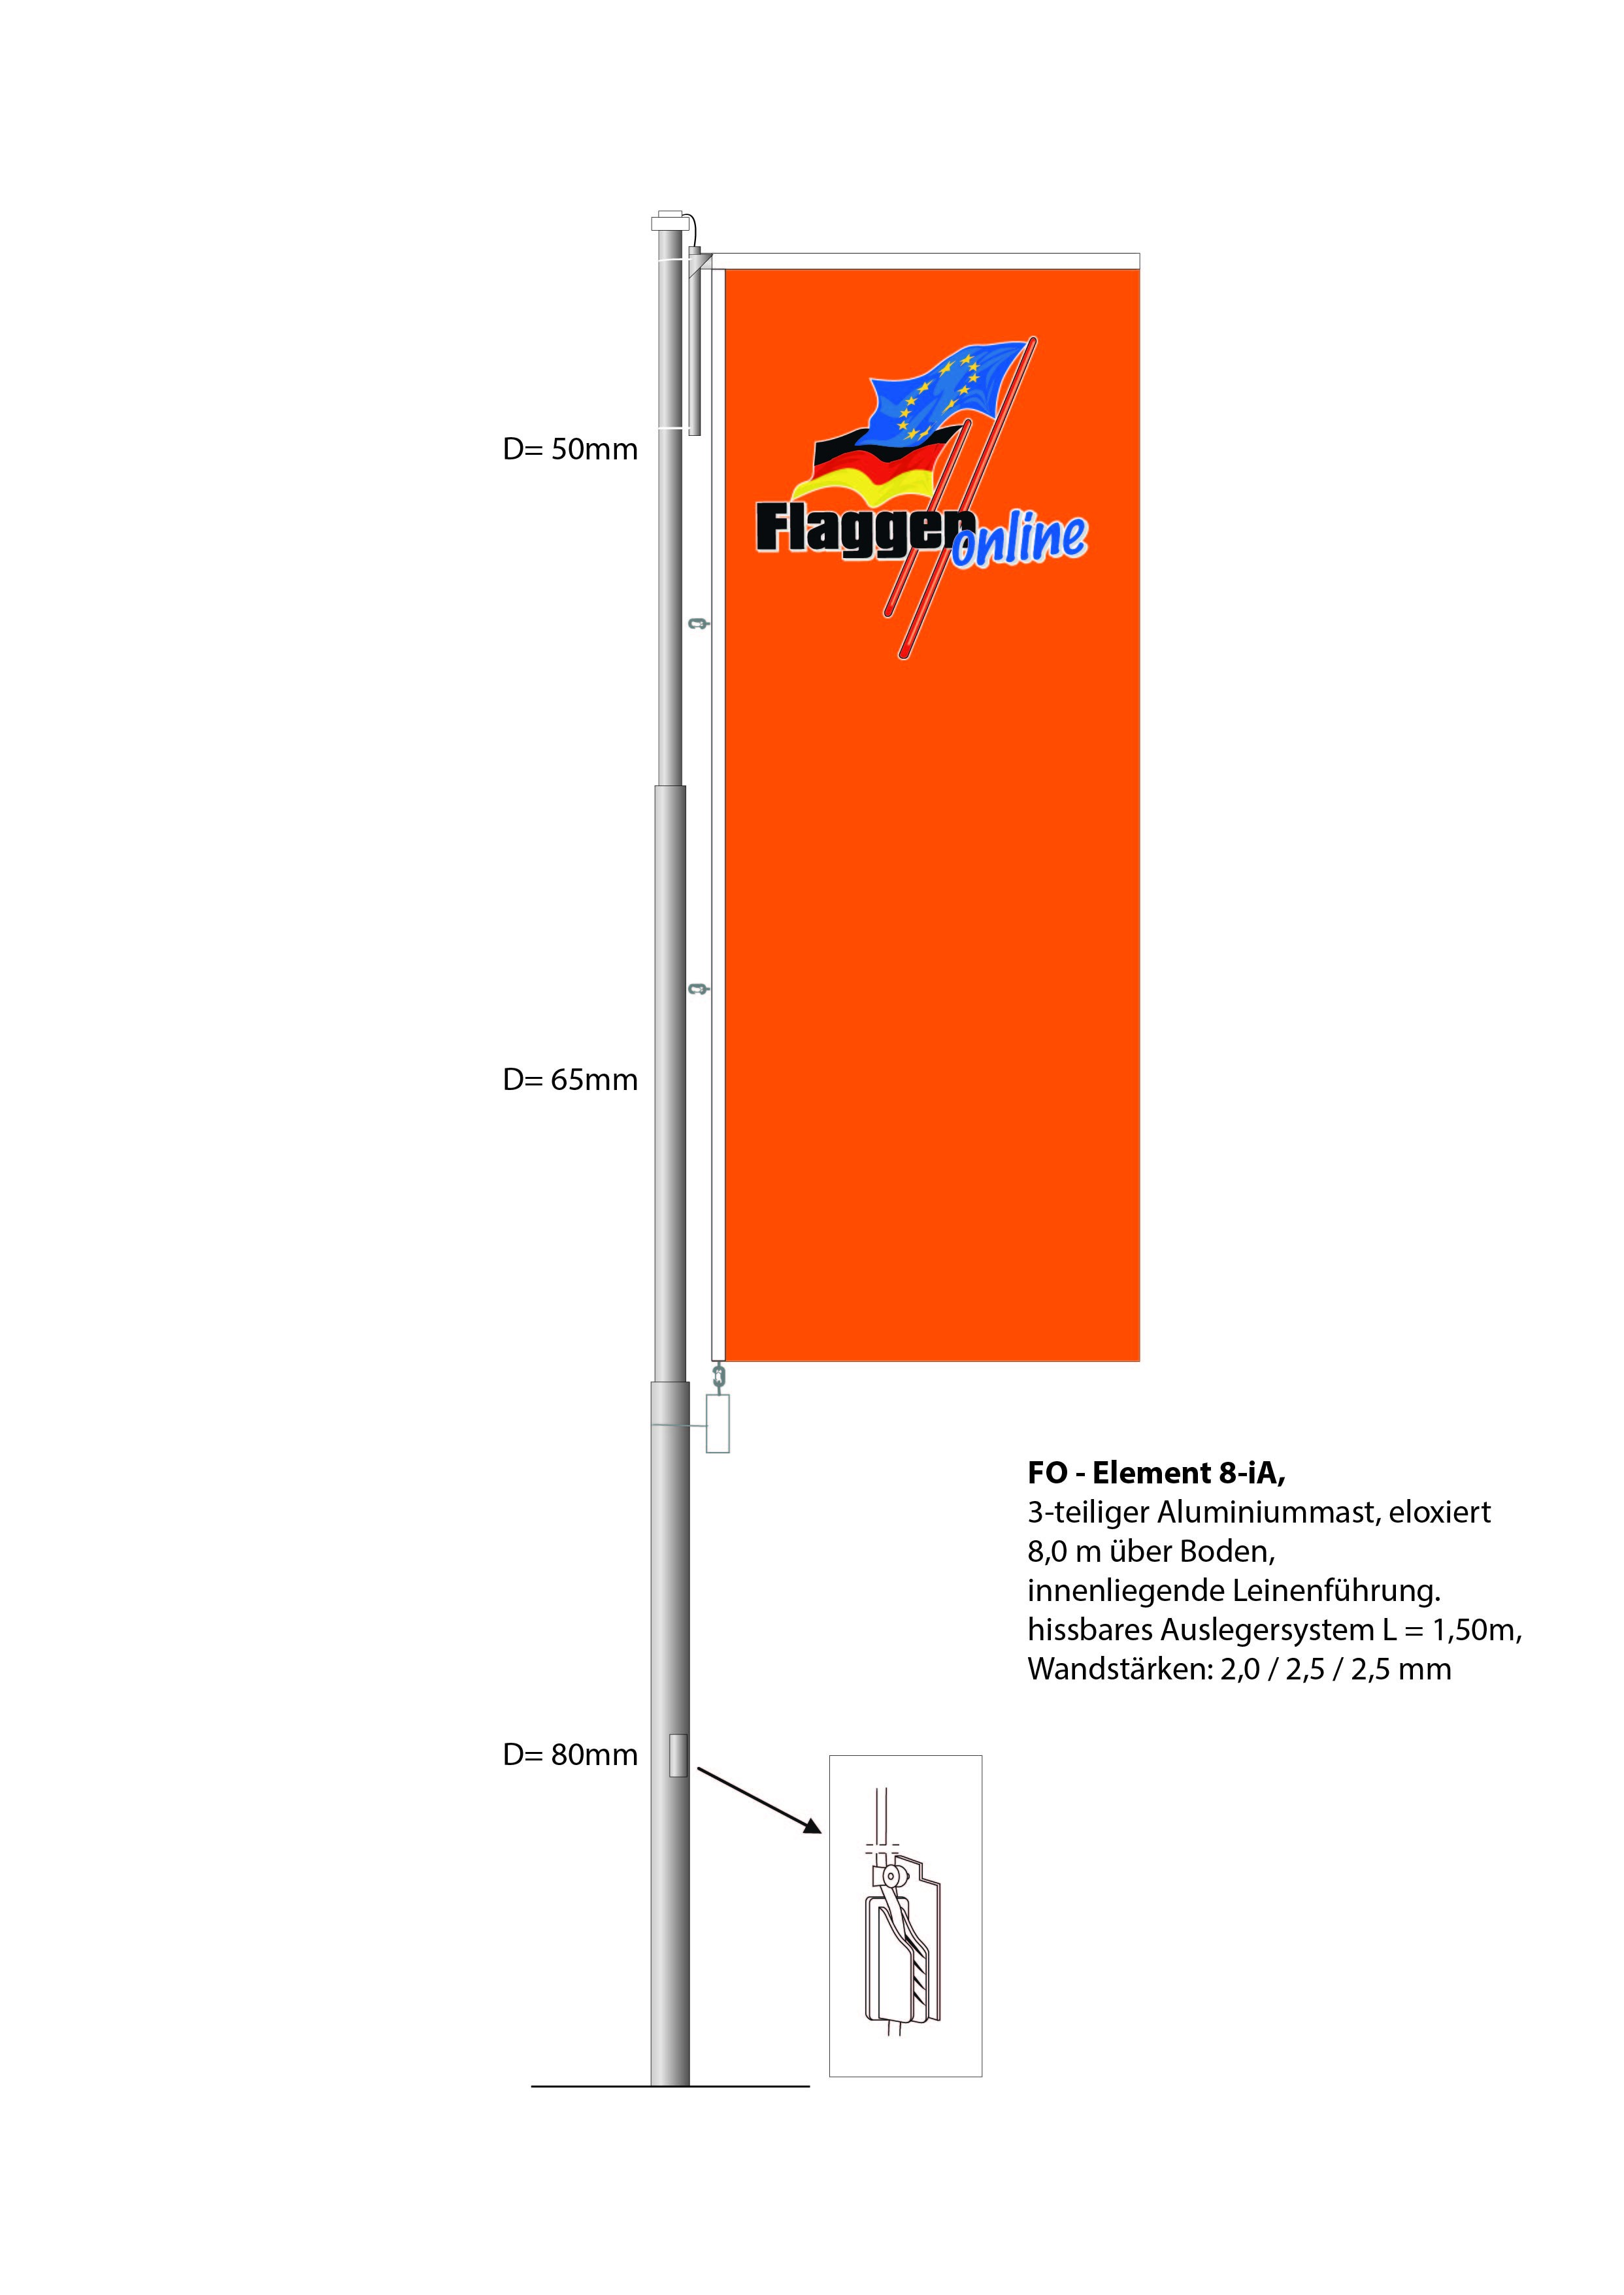 Alu-Flaggenmast FO-Element  8-iA, 8 Meter über Boden